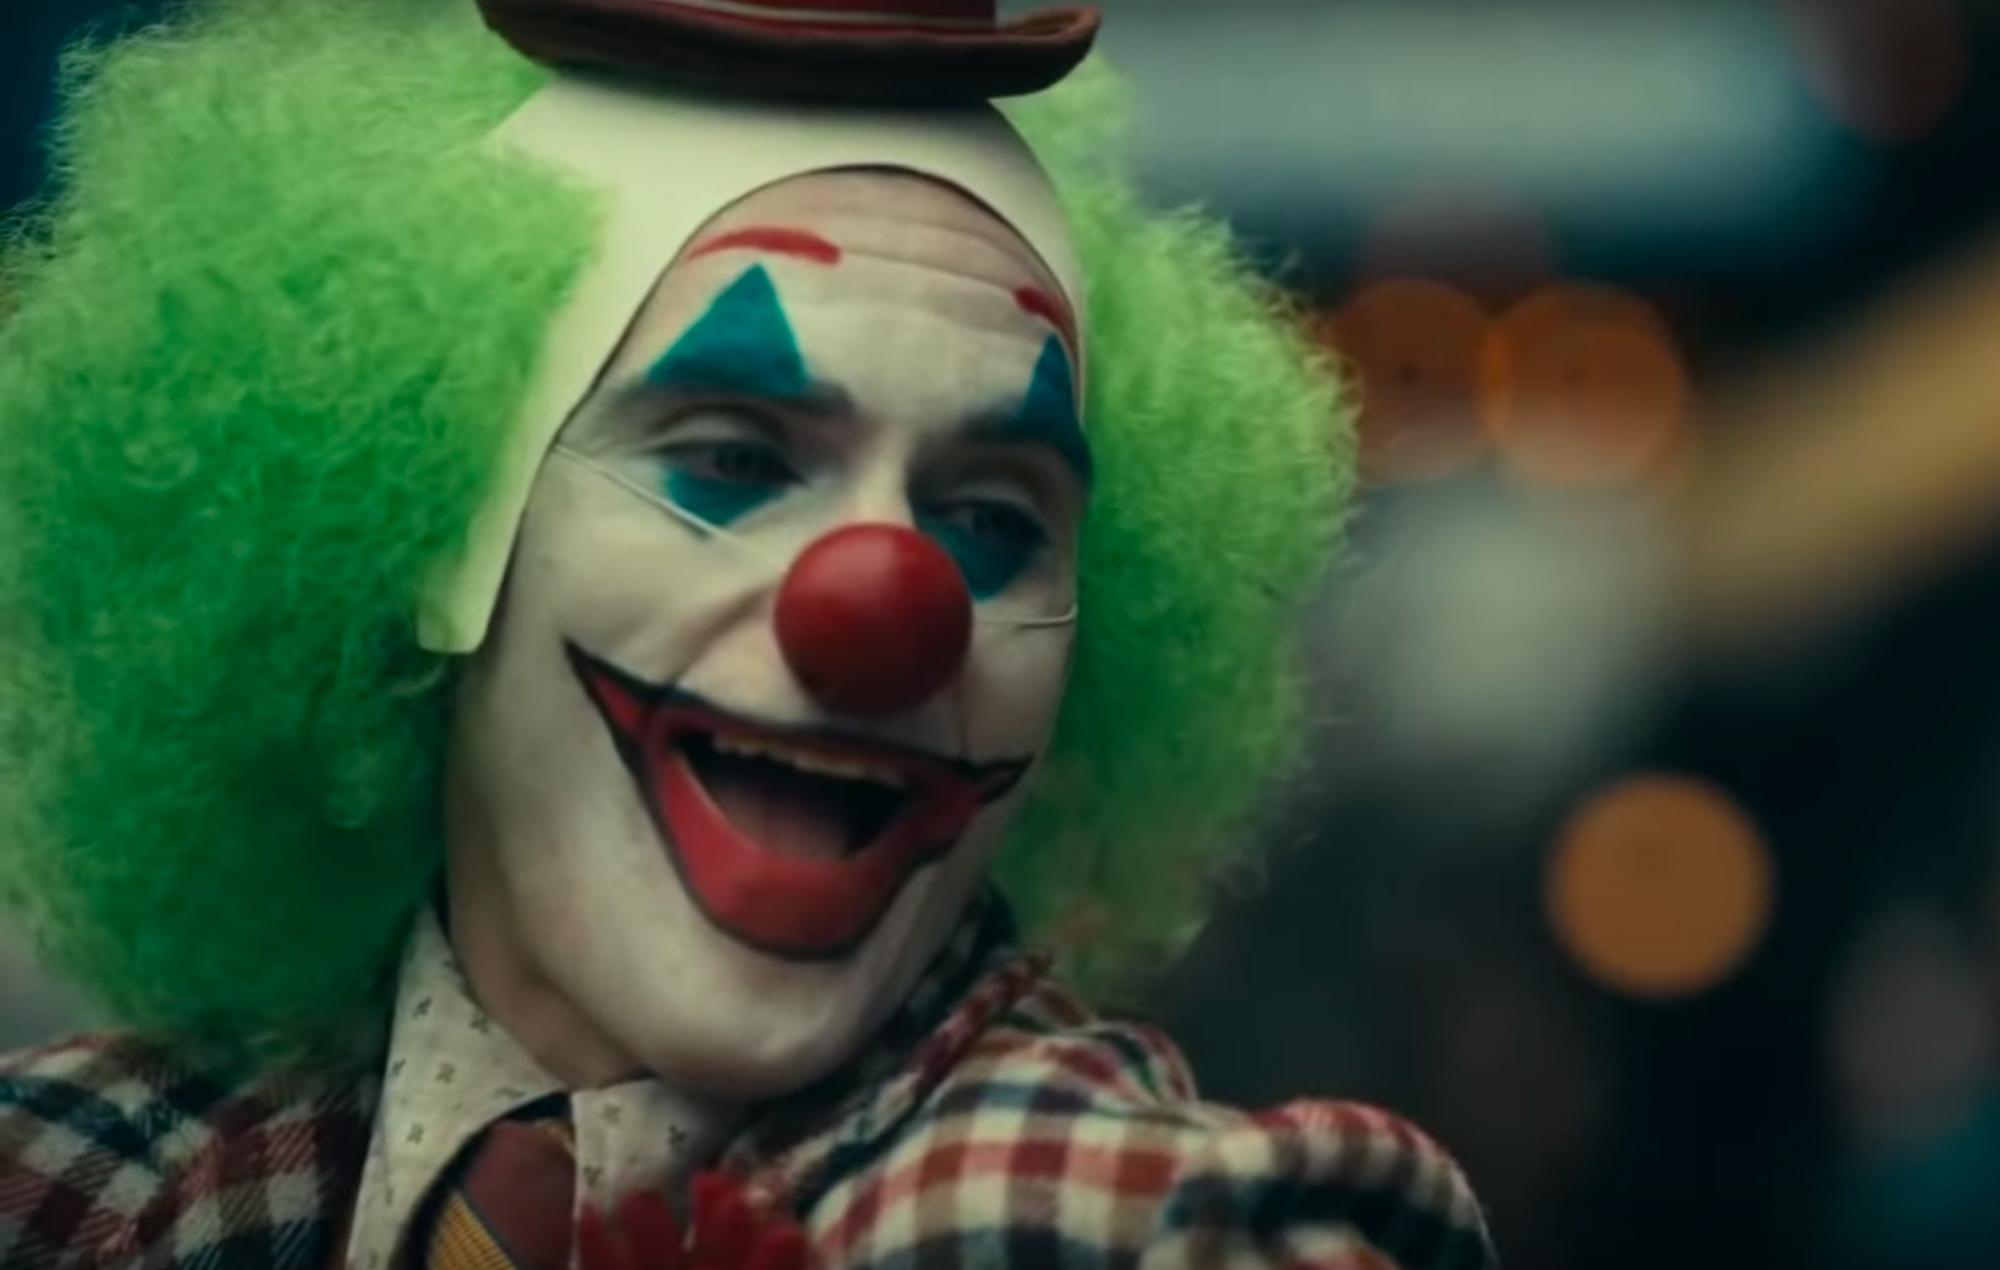 'Joker' cinematographer says Warner Bros. overruled plans to shoot on 70mm film